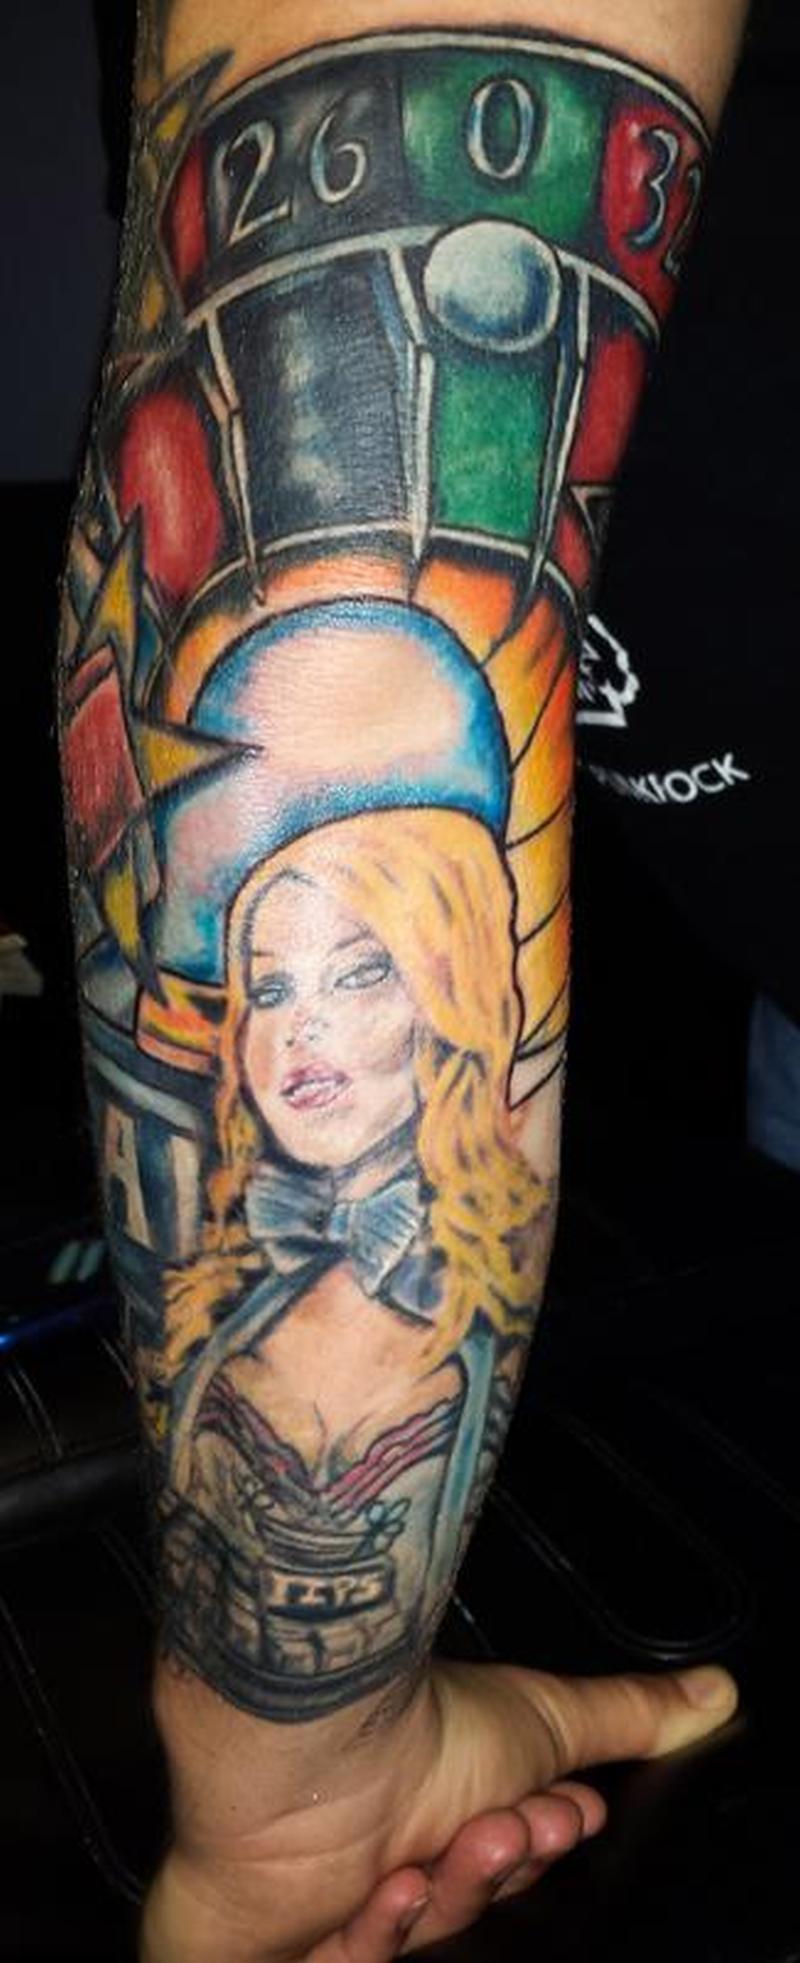 Gambling sleeve tattoo design